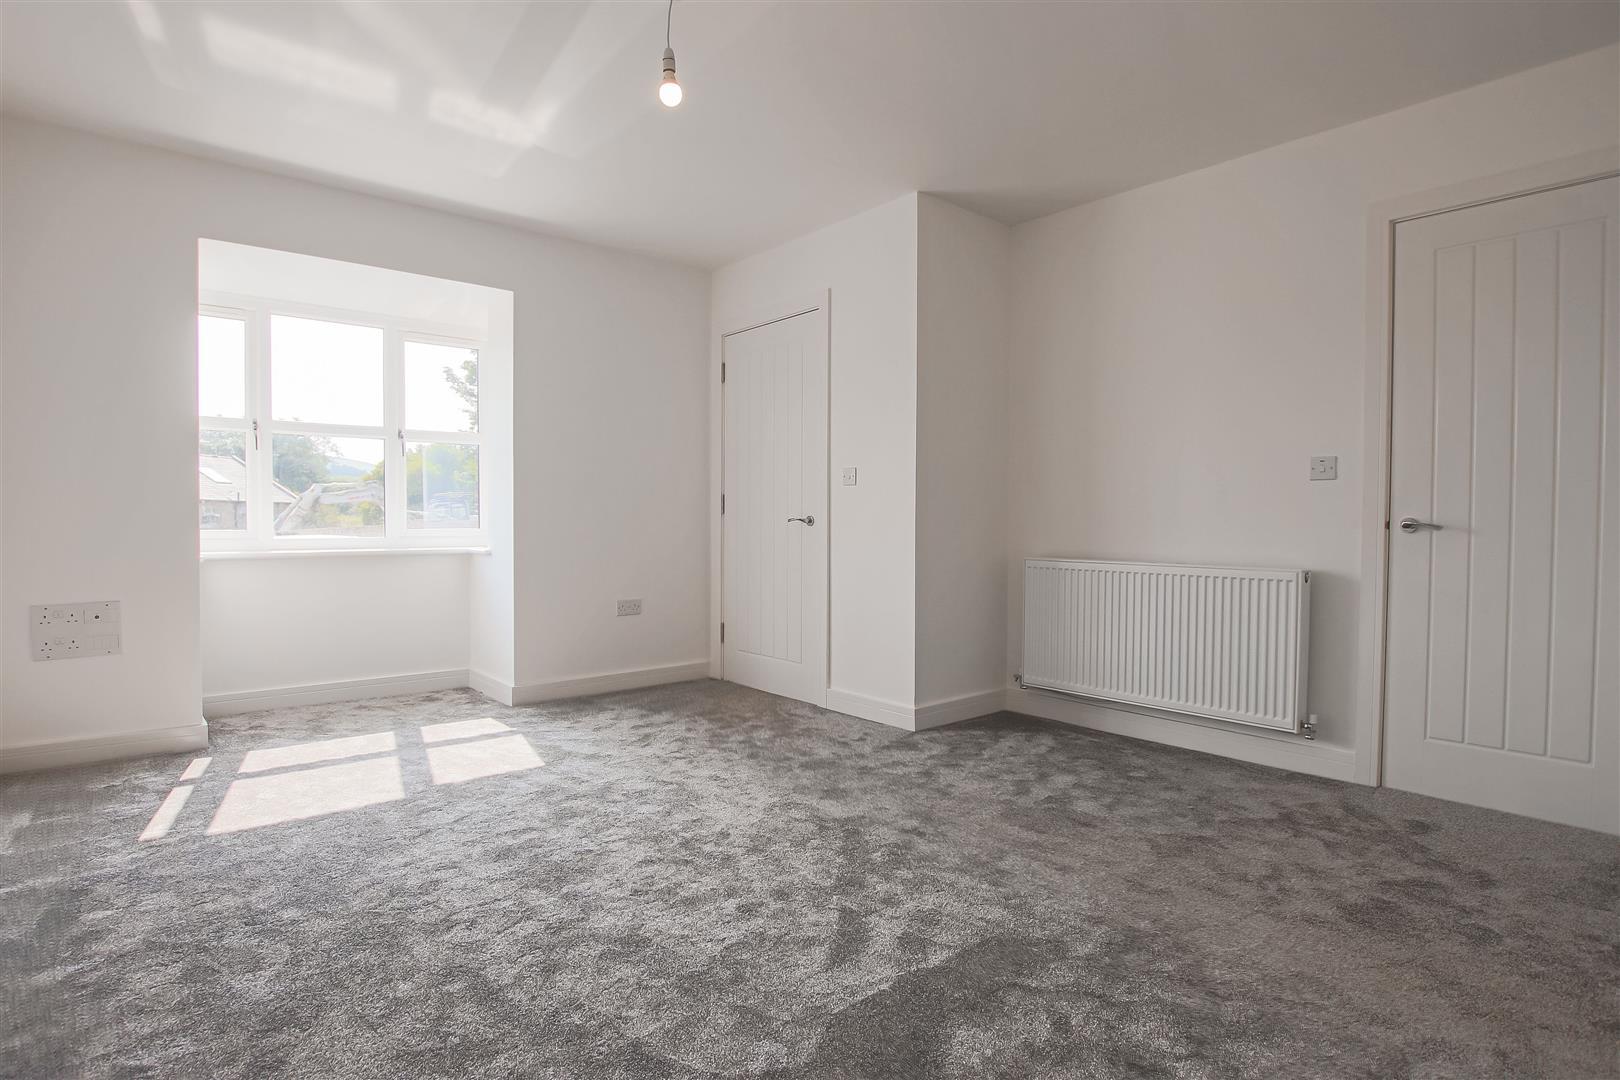 4 Bedroom Detached House For Sale - Show Home Reception Room (1).jpg